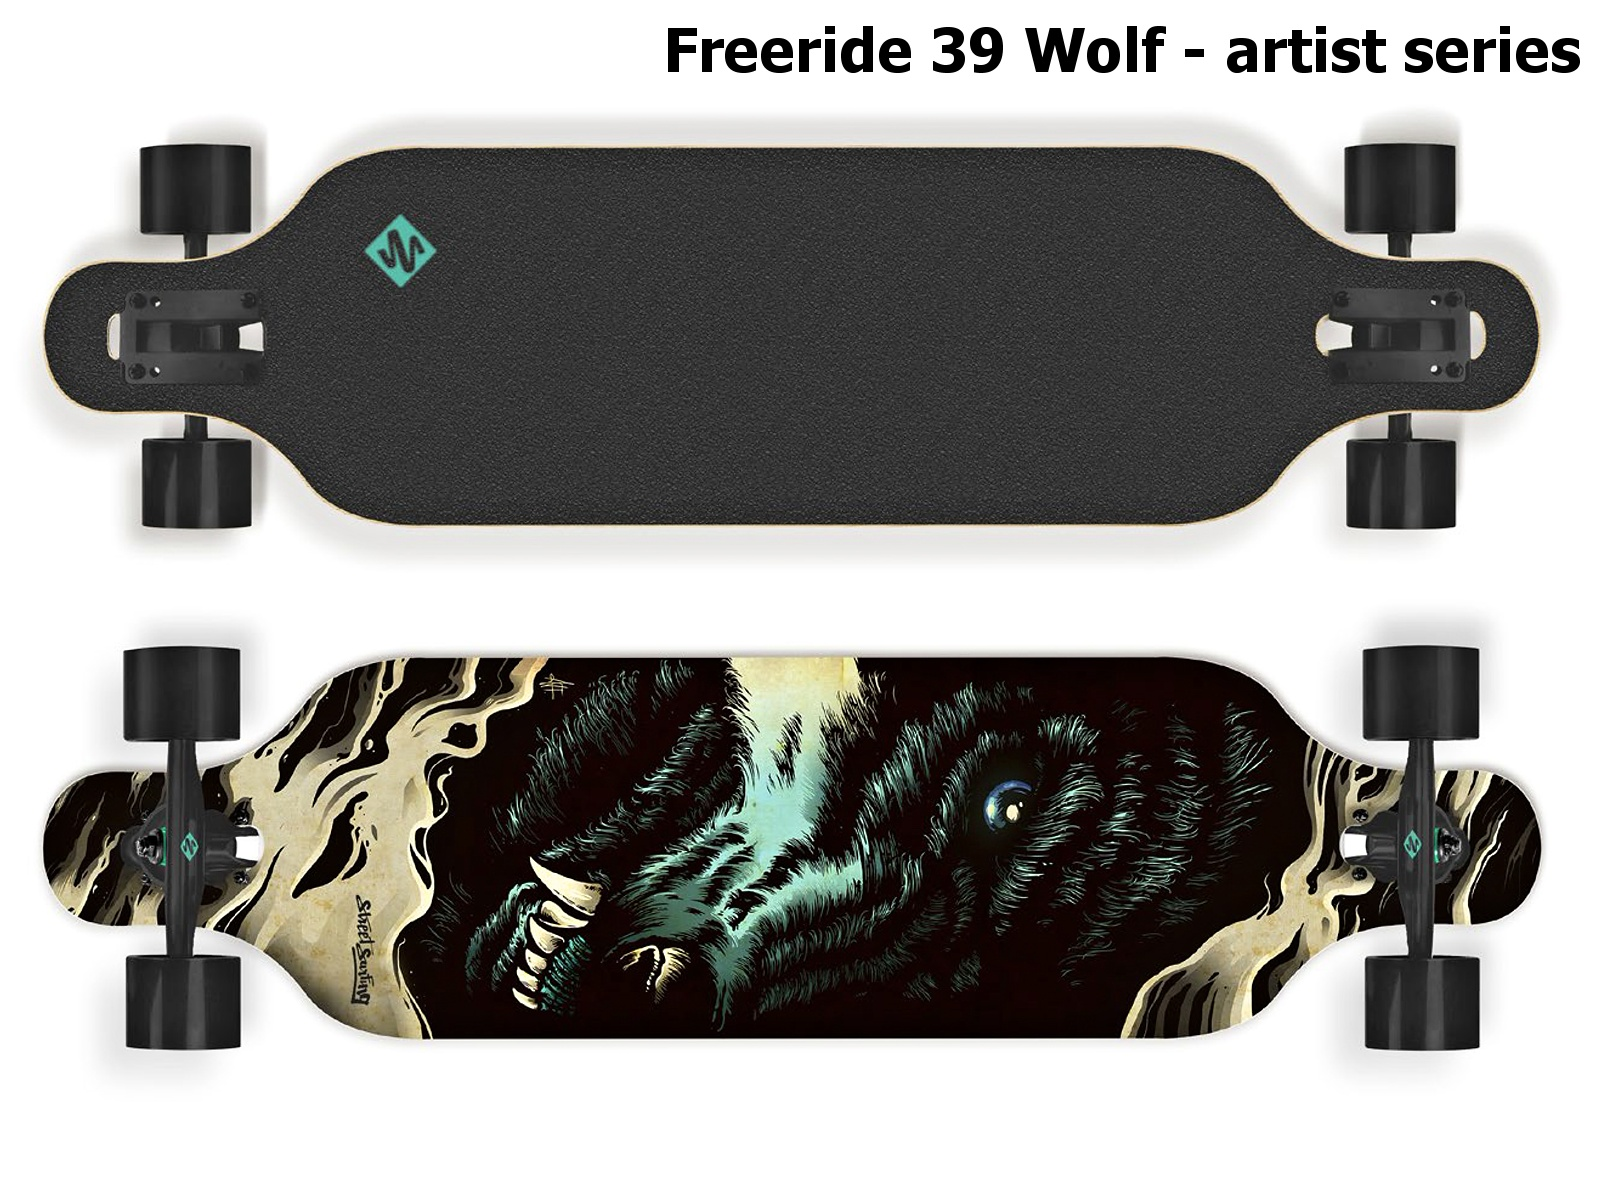 Longboard STREET SURFING Freeride 39 Wolf - vlk